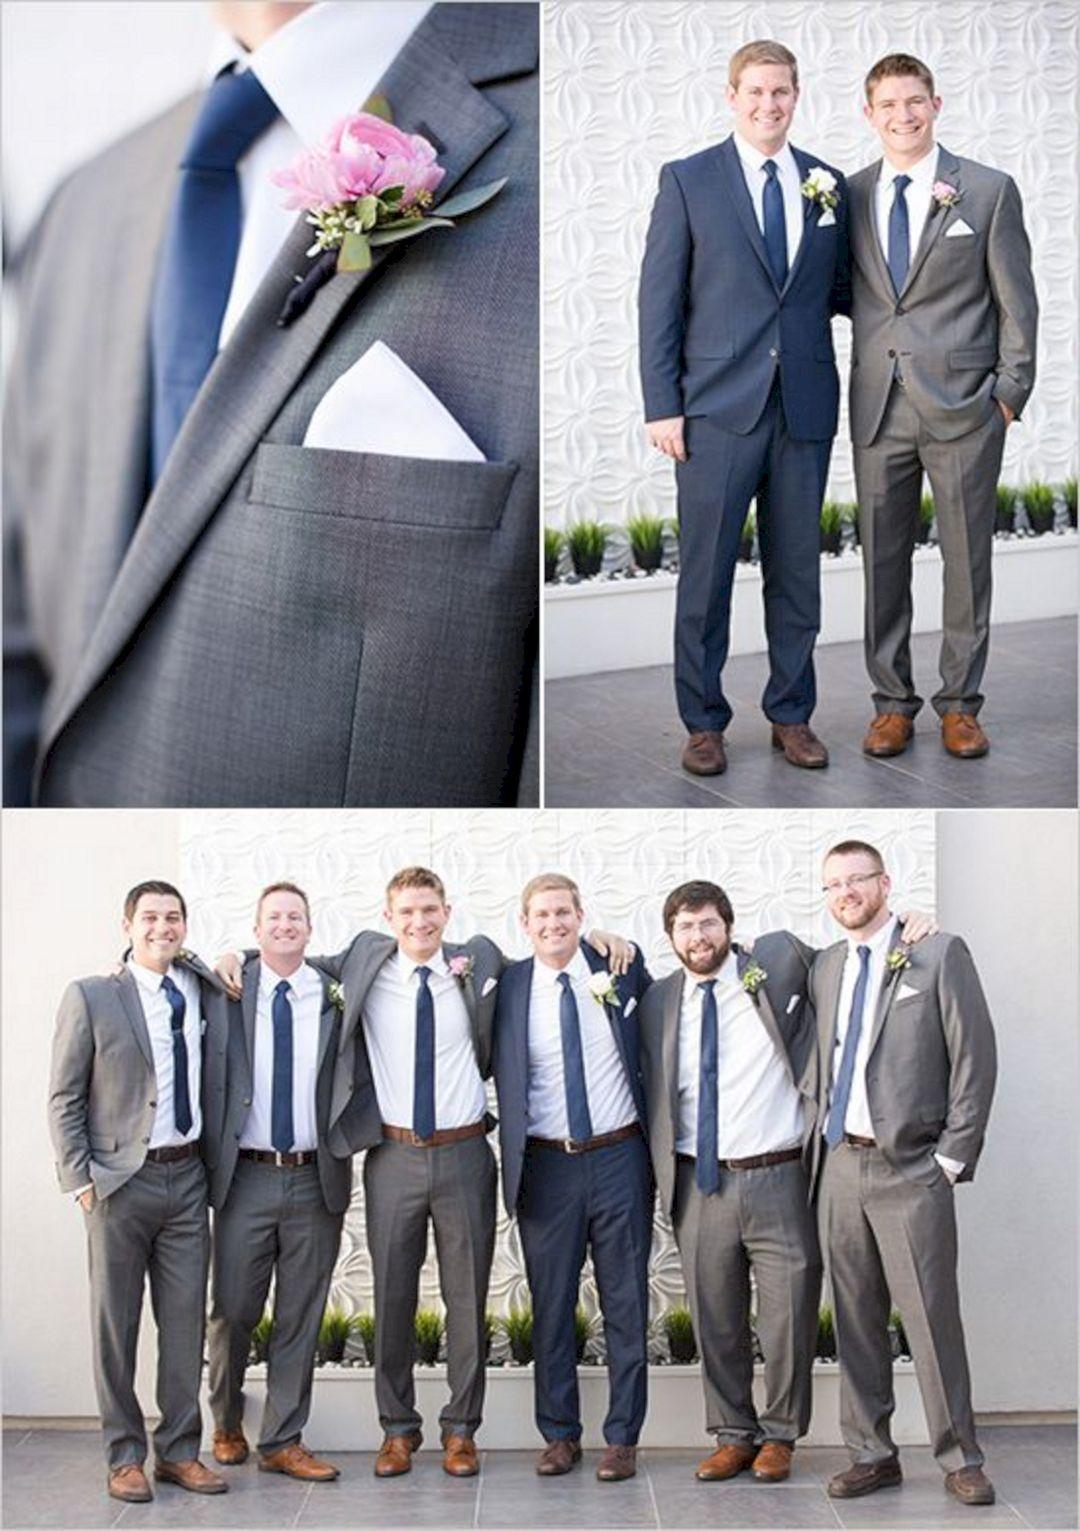 35 Best Groomsmen Navy And Grey For Beautiful Wedding Ideas ...